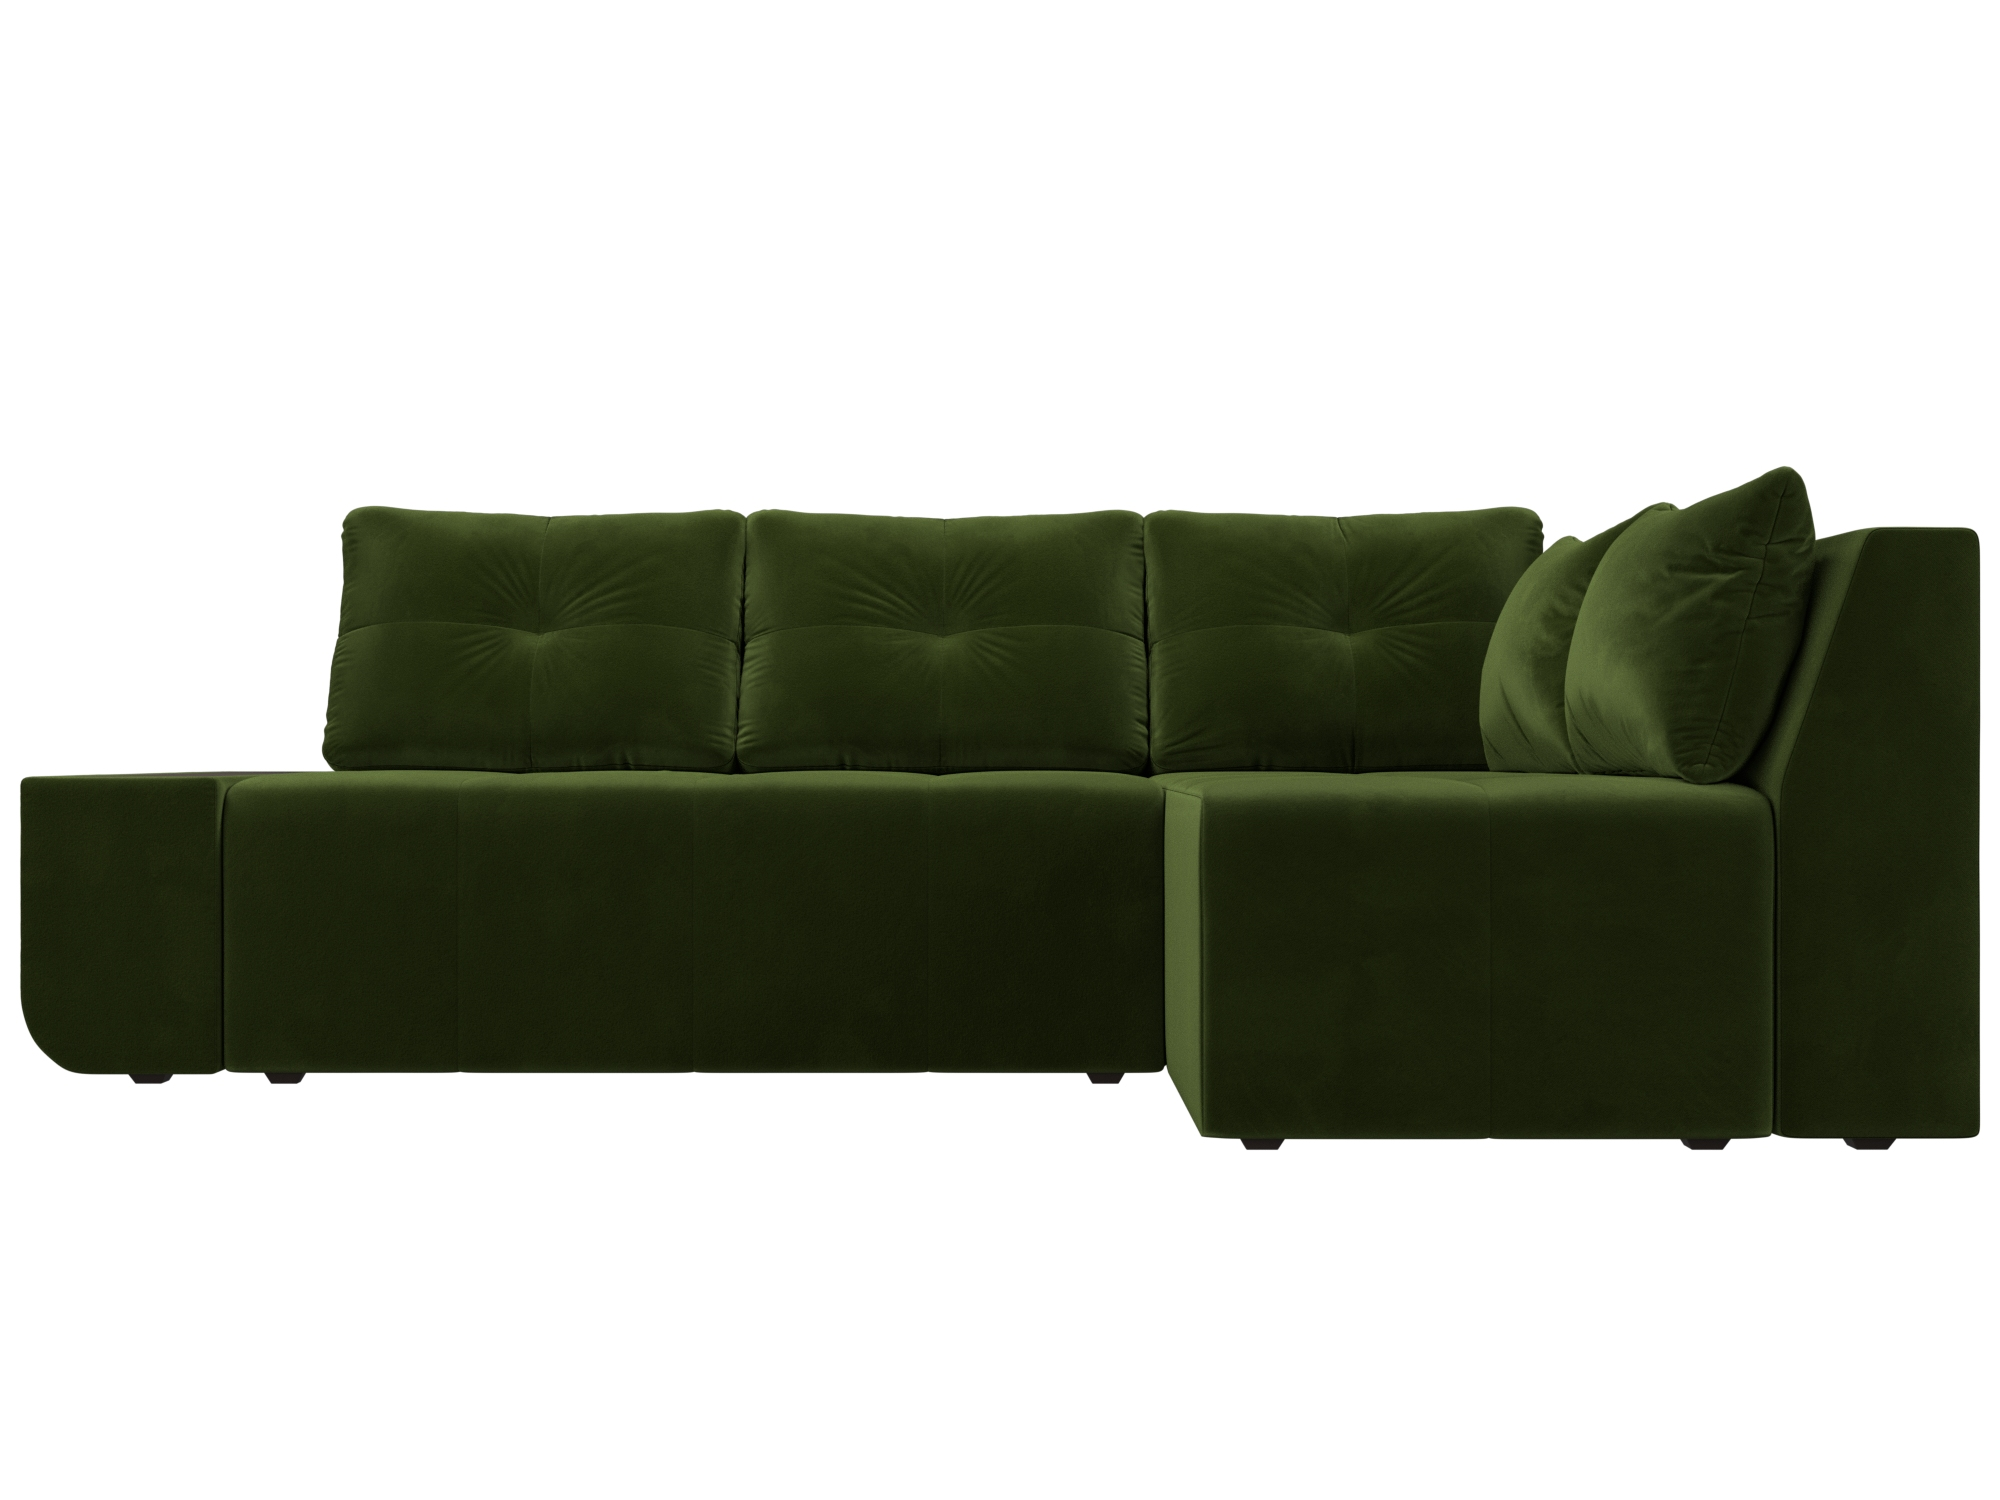 Угловой диван Амадэус Правый MebelVia Зеленый, Микровельвет, ЛДСП Зеленый